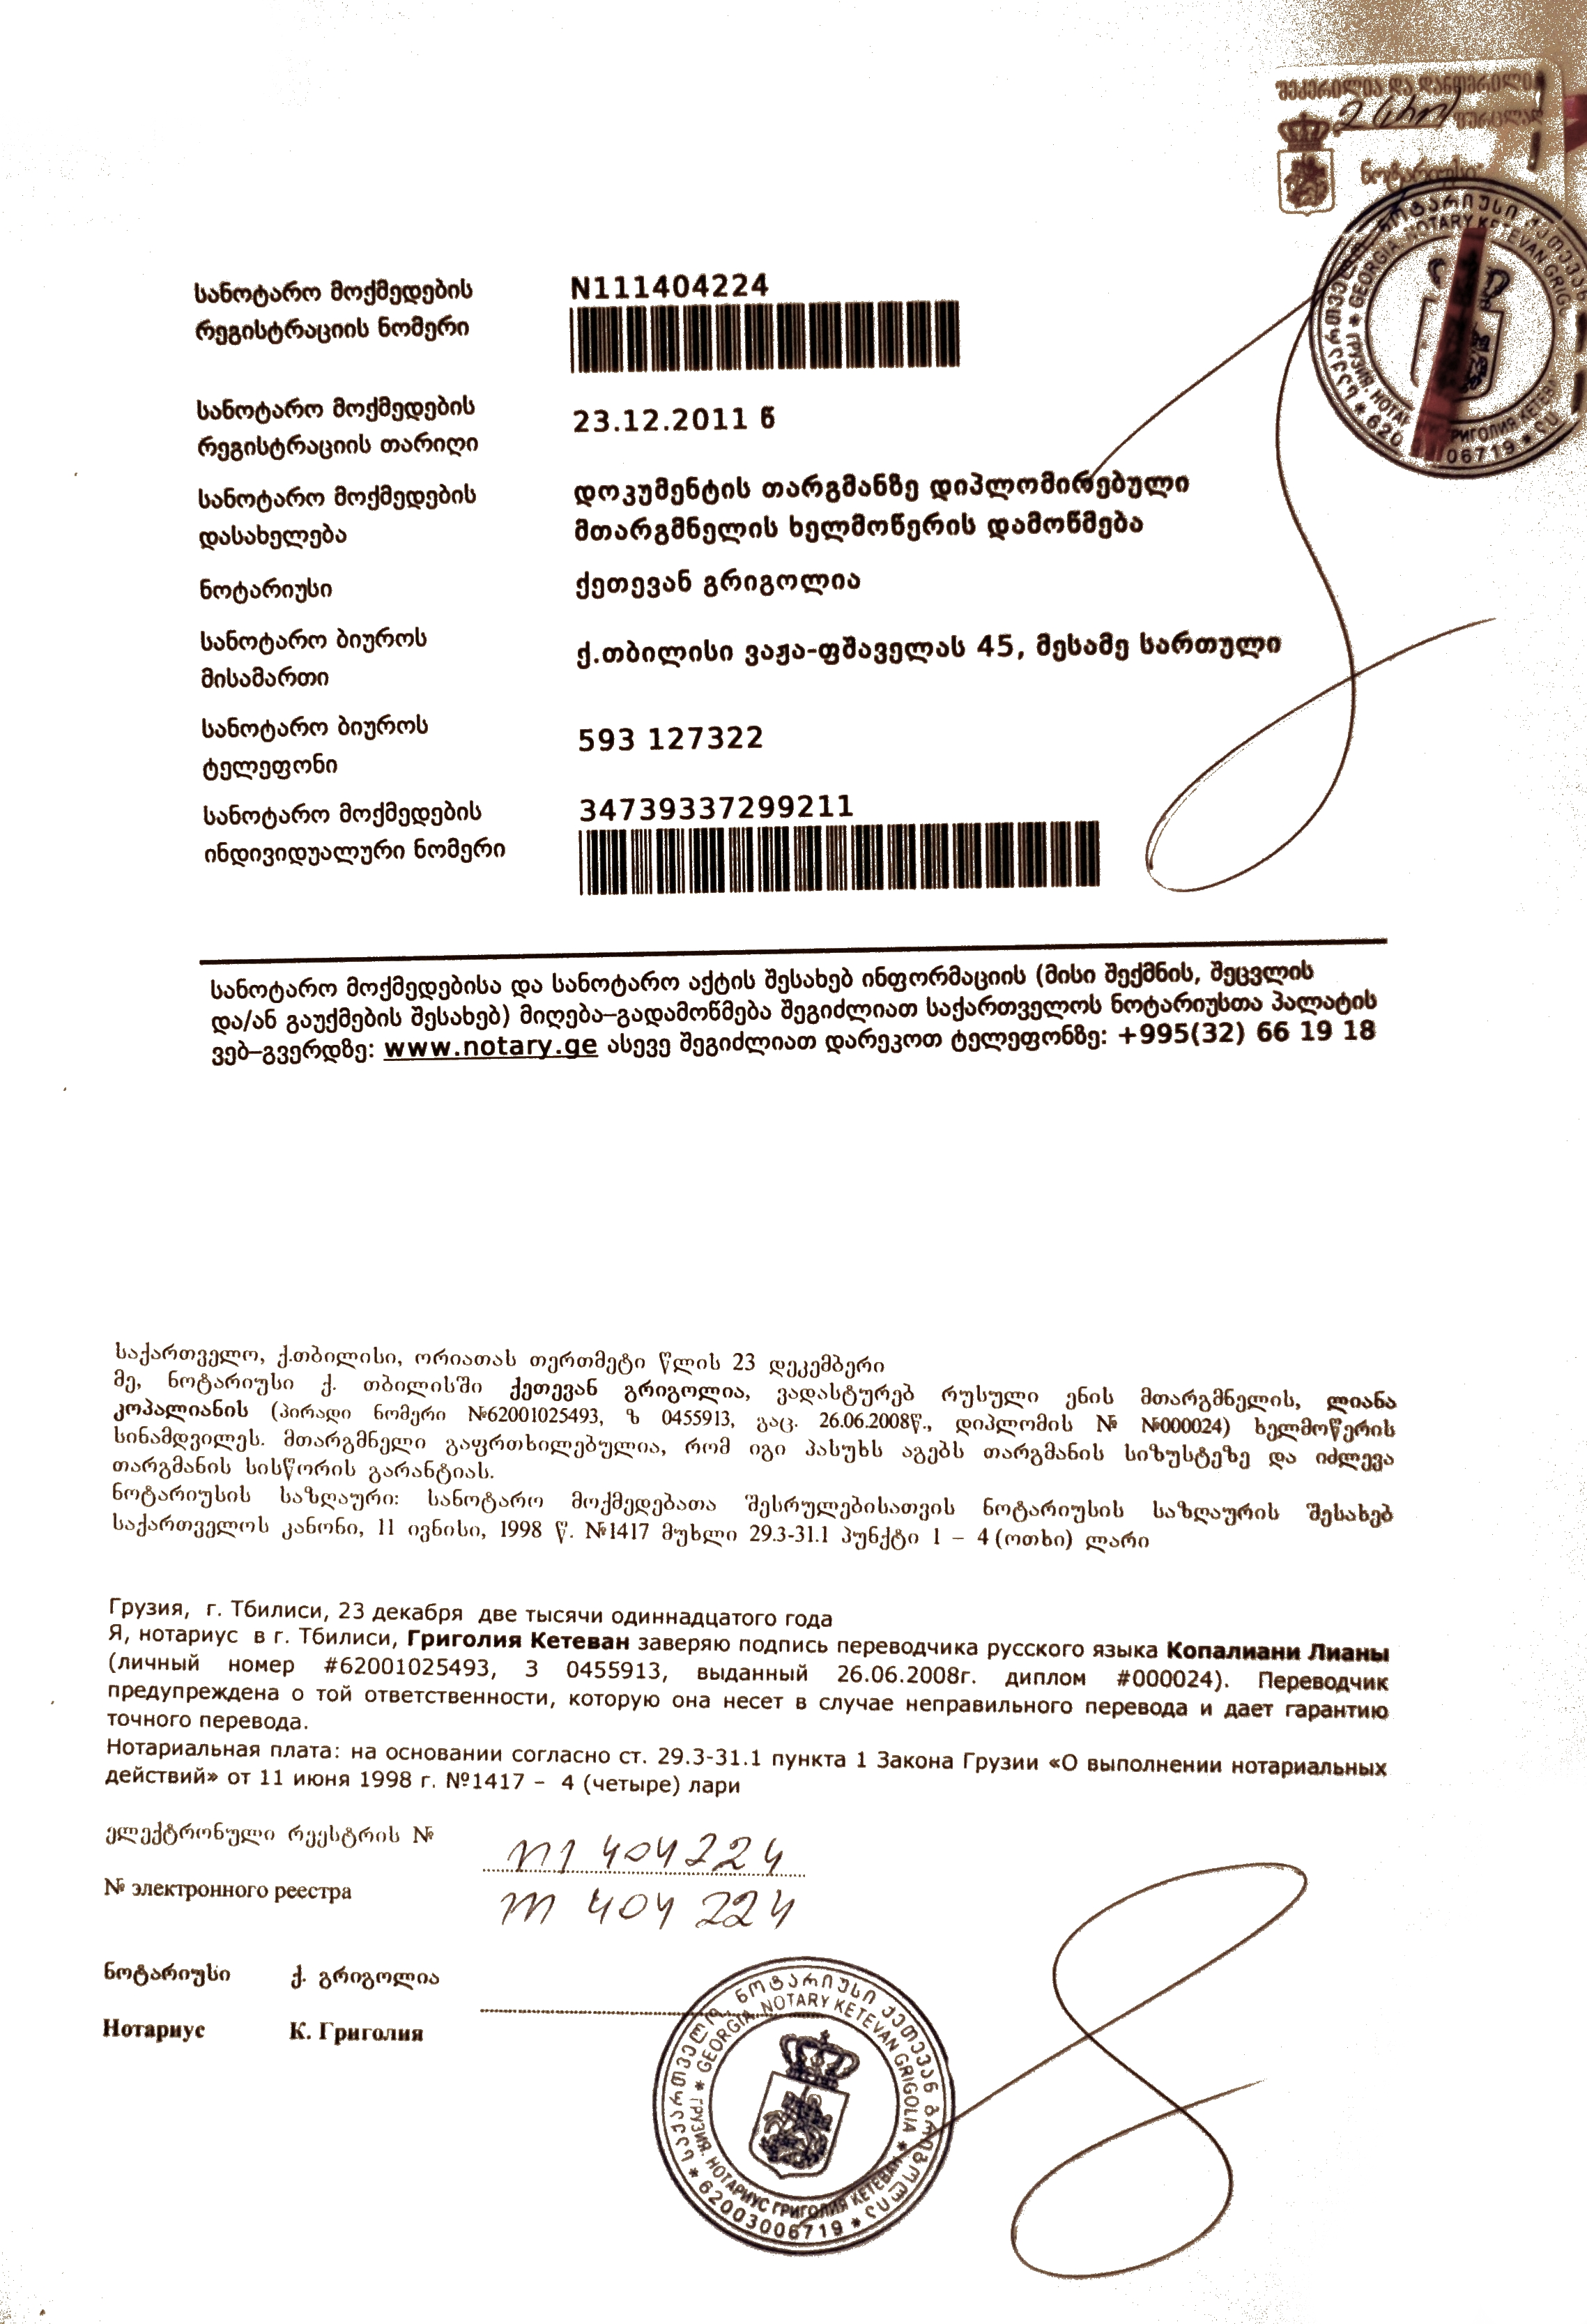 20111123_СААКАШВИЛИ_МИНБЕЖ_DSC03130